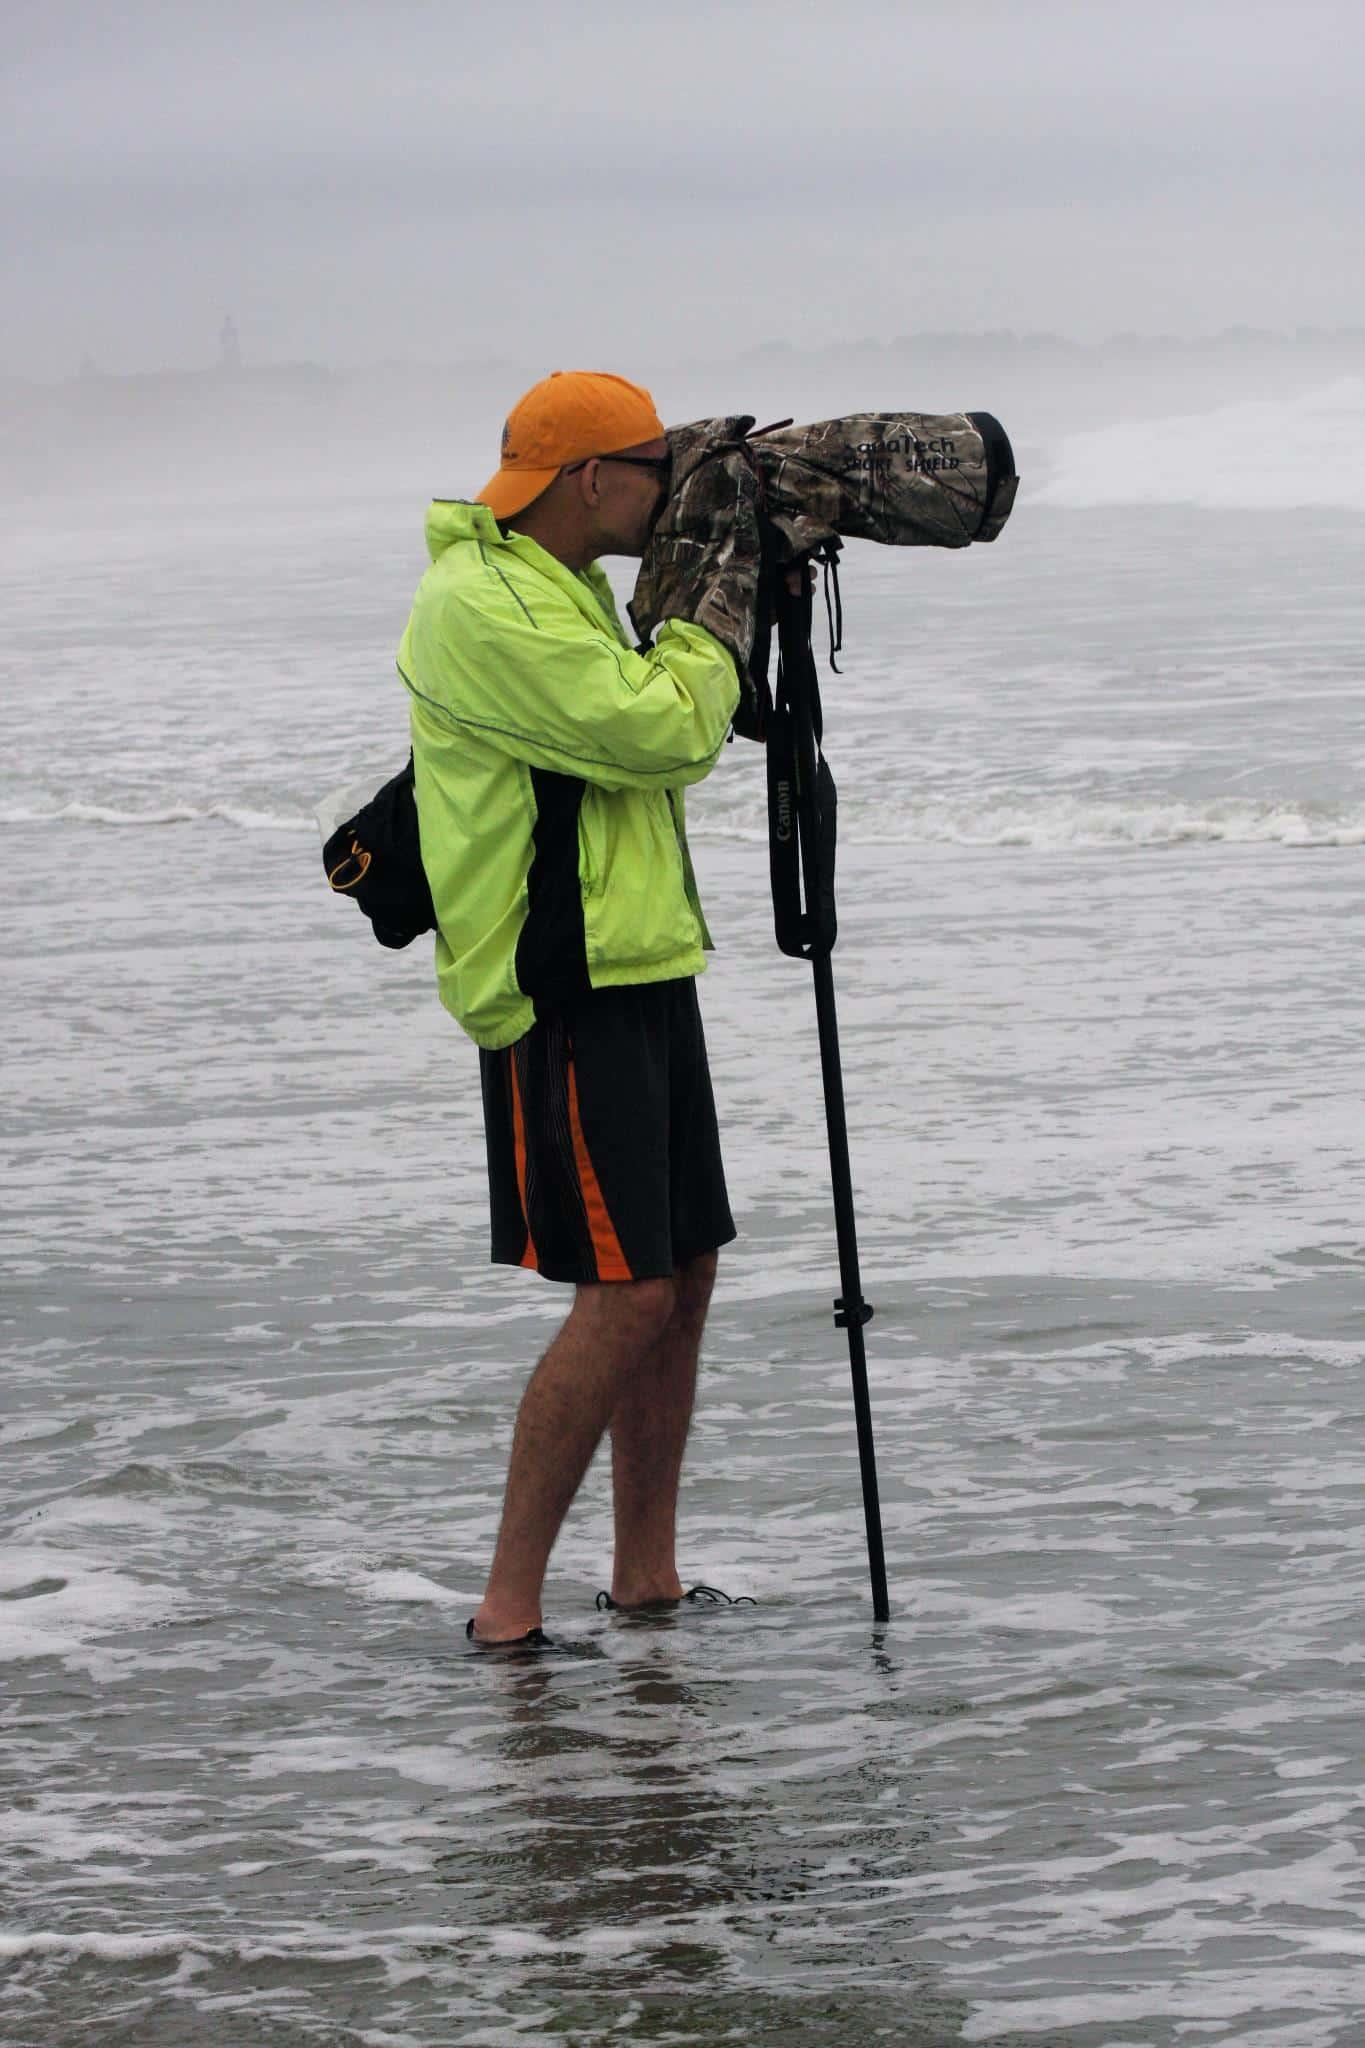 George Ross, Photographer